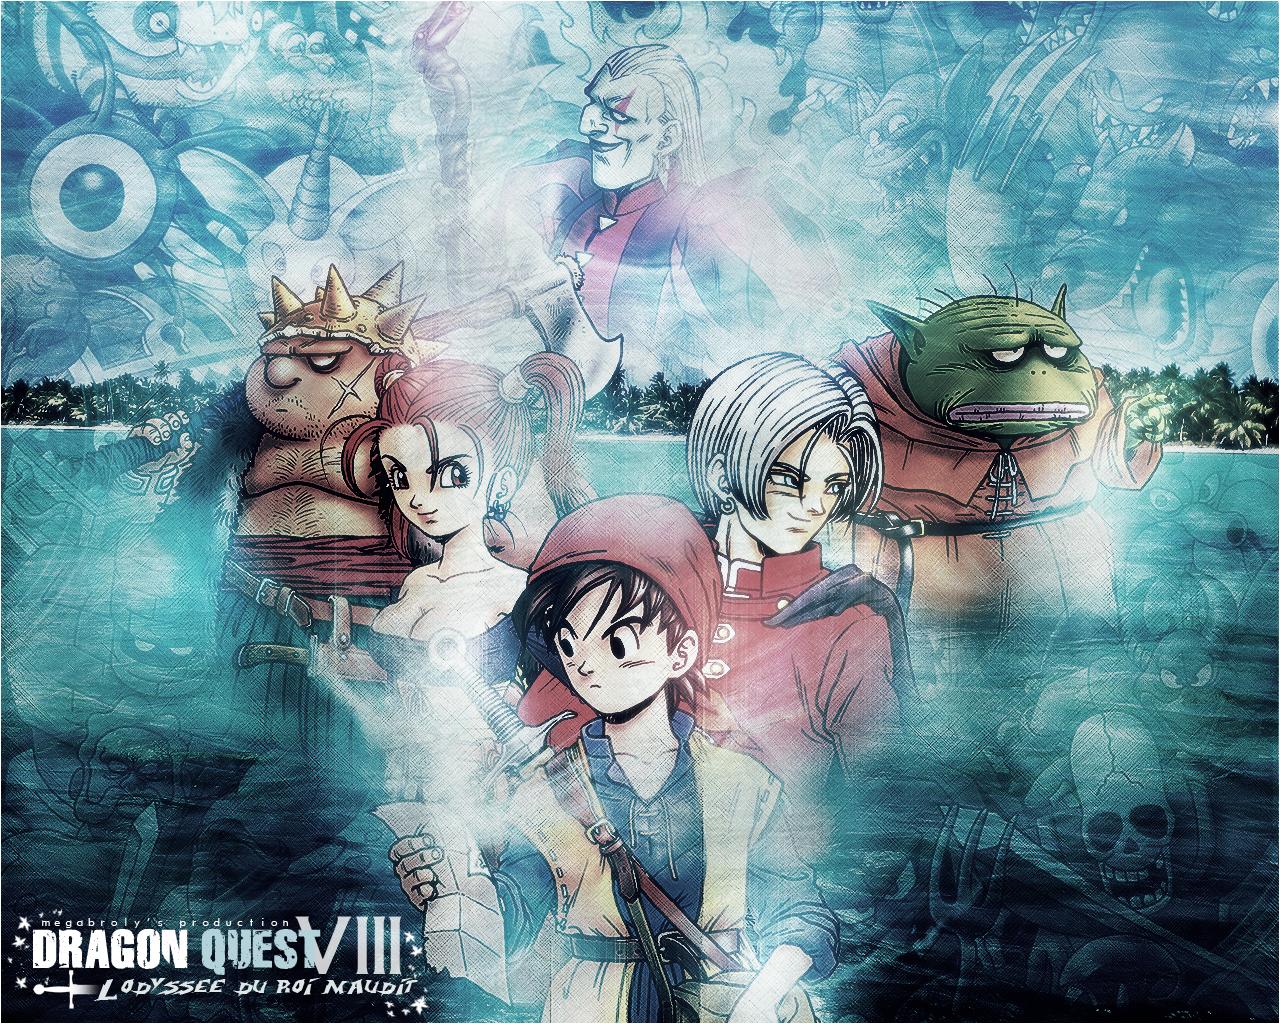 http://fc08.deviantart.com/fs43/f/2009/063/0/8/Wall___Dragon_Quest_by_brolyomega.png